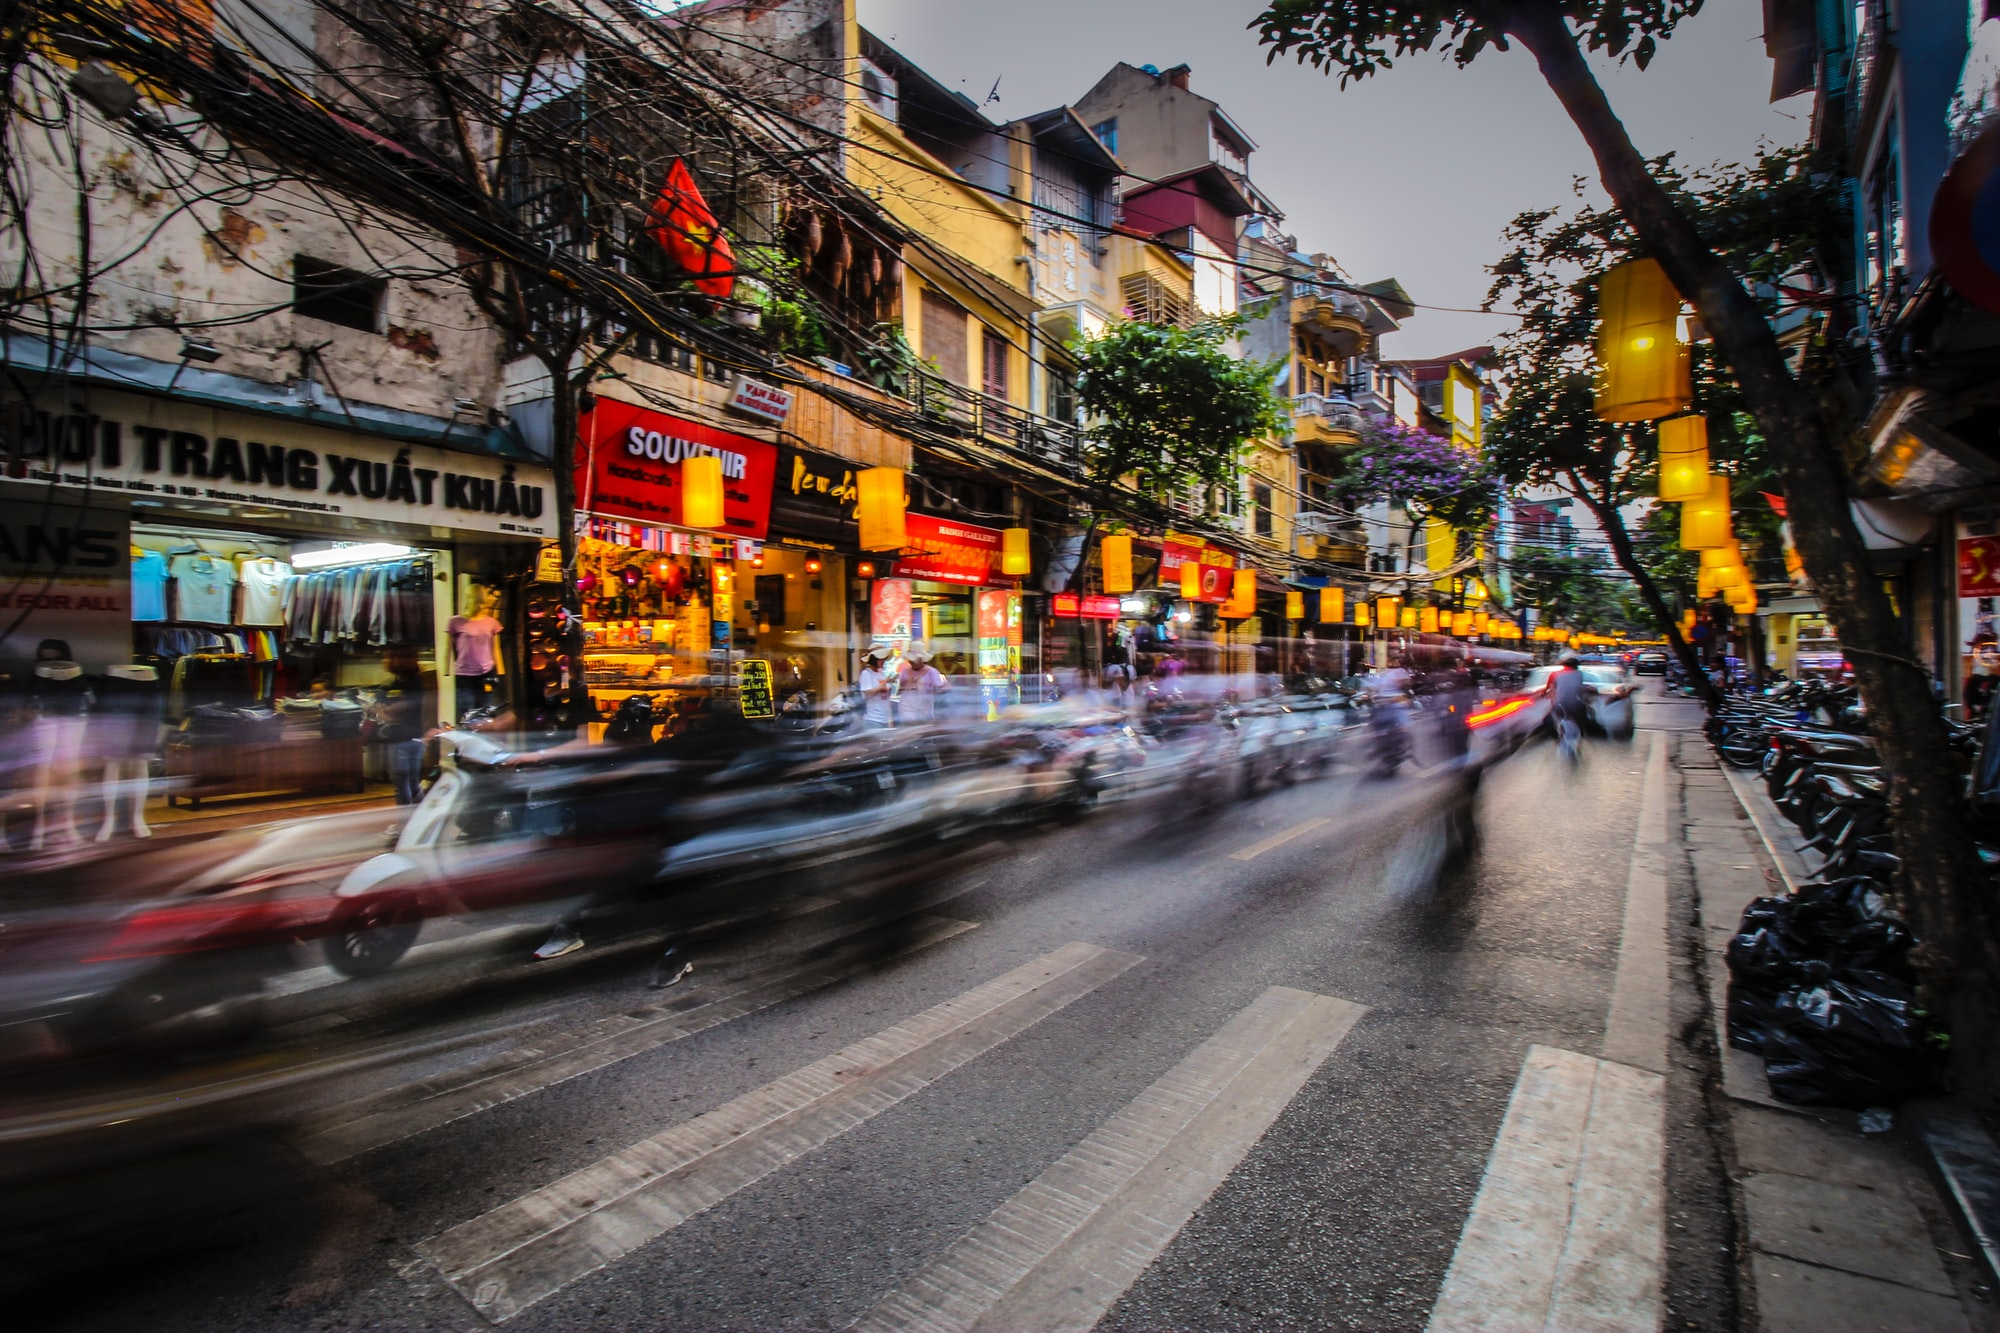 Busy night in Hanoi